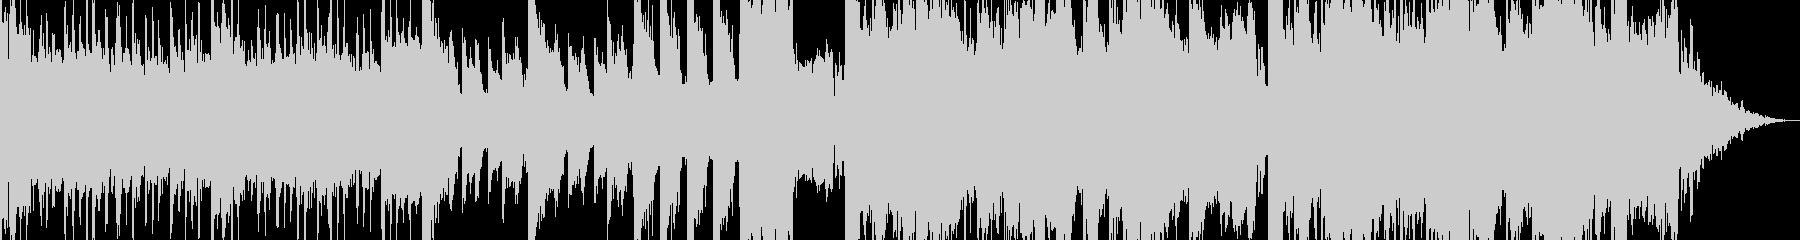 【EDM】エネルギッシュ・鼓舞_02の未再生の波形